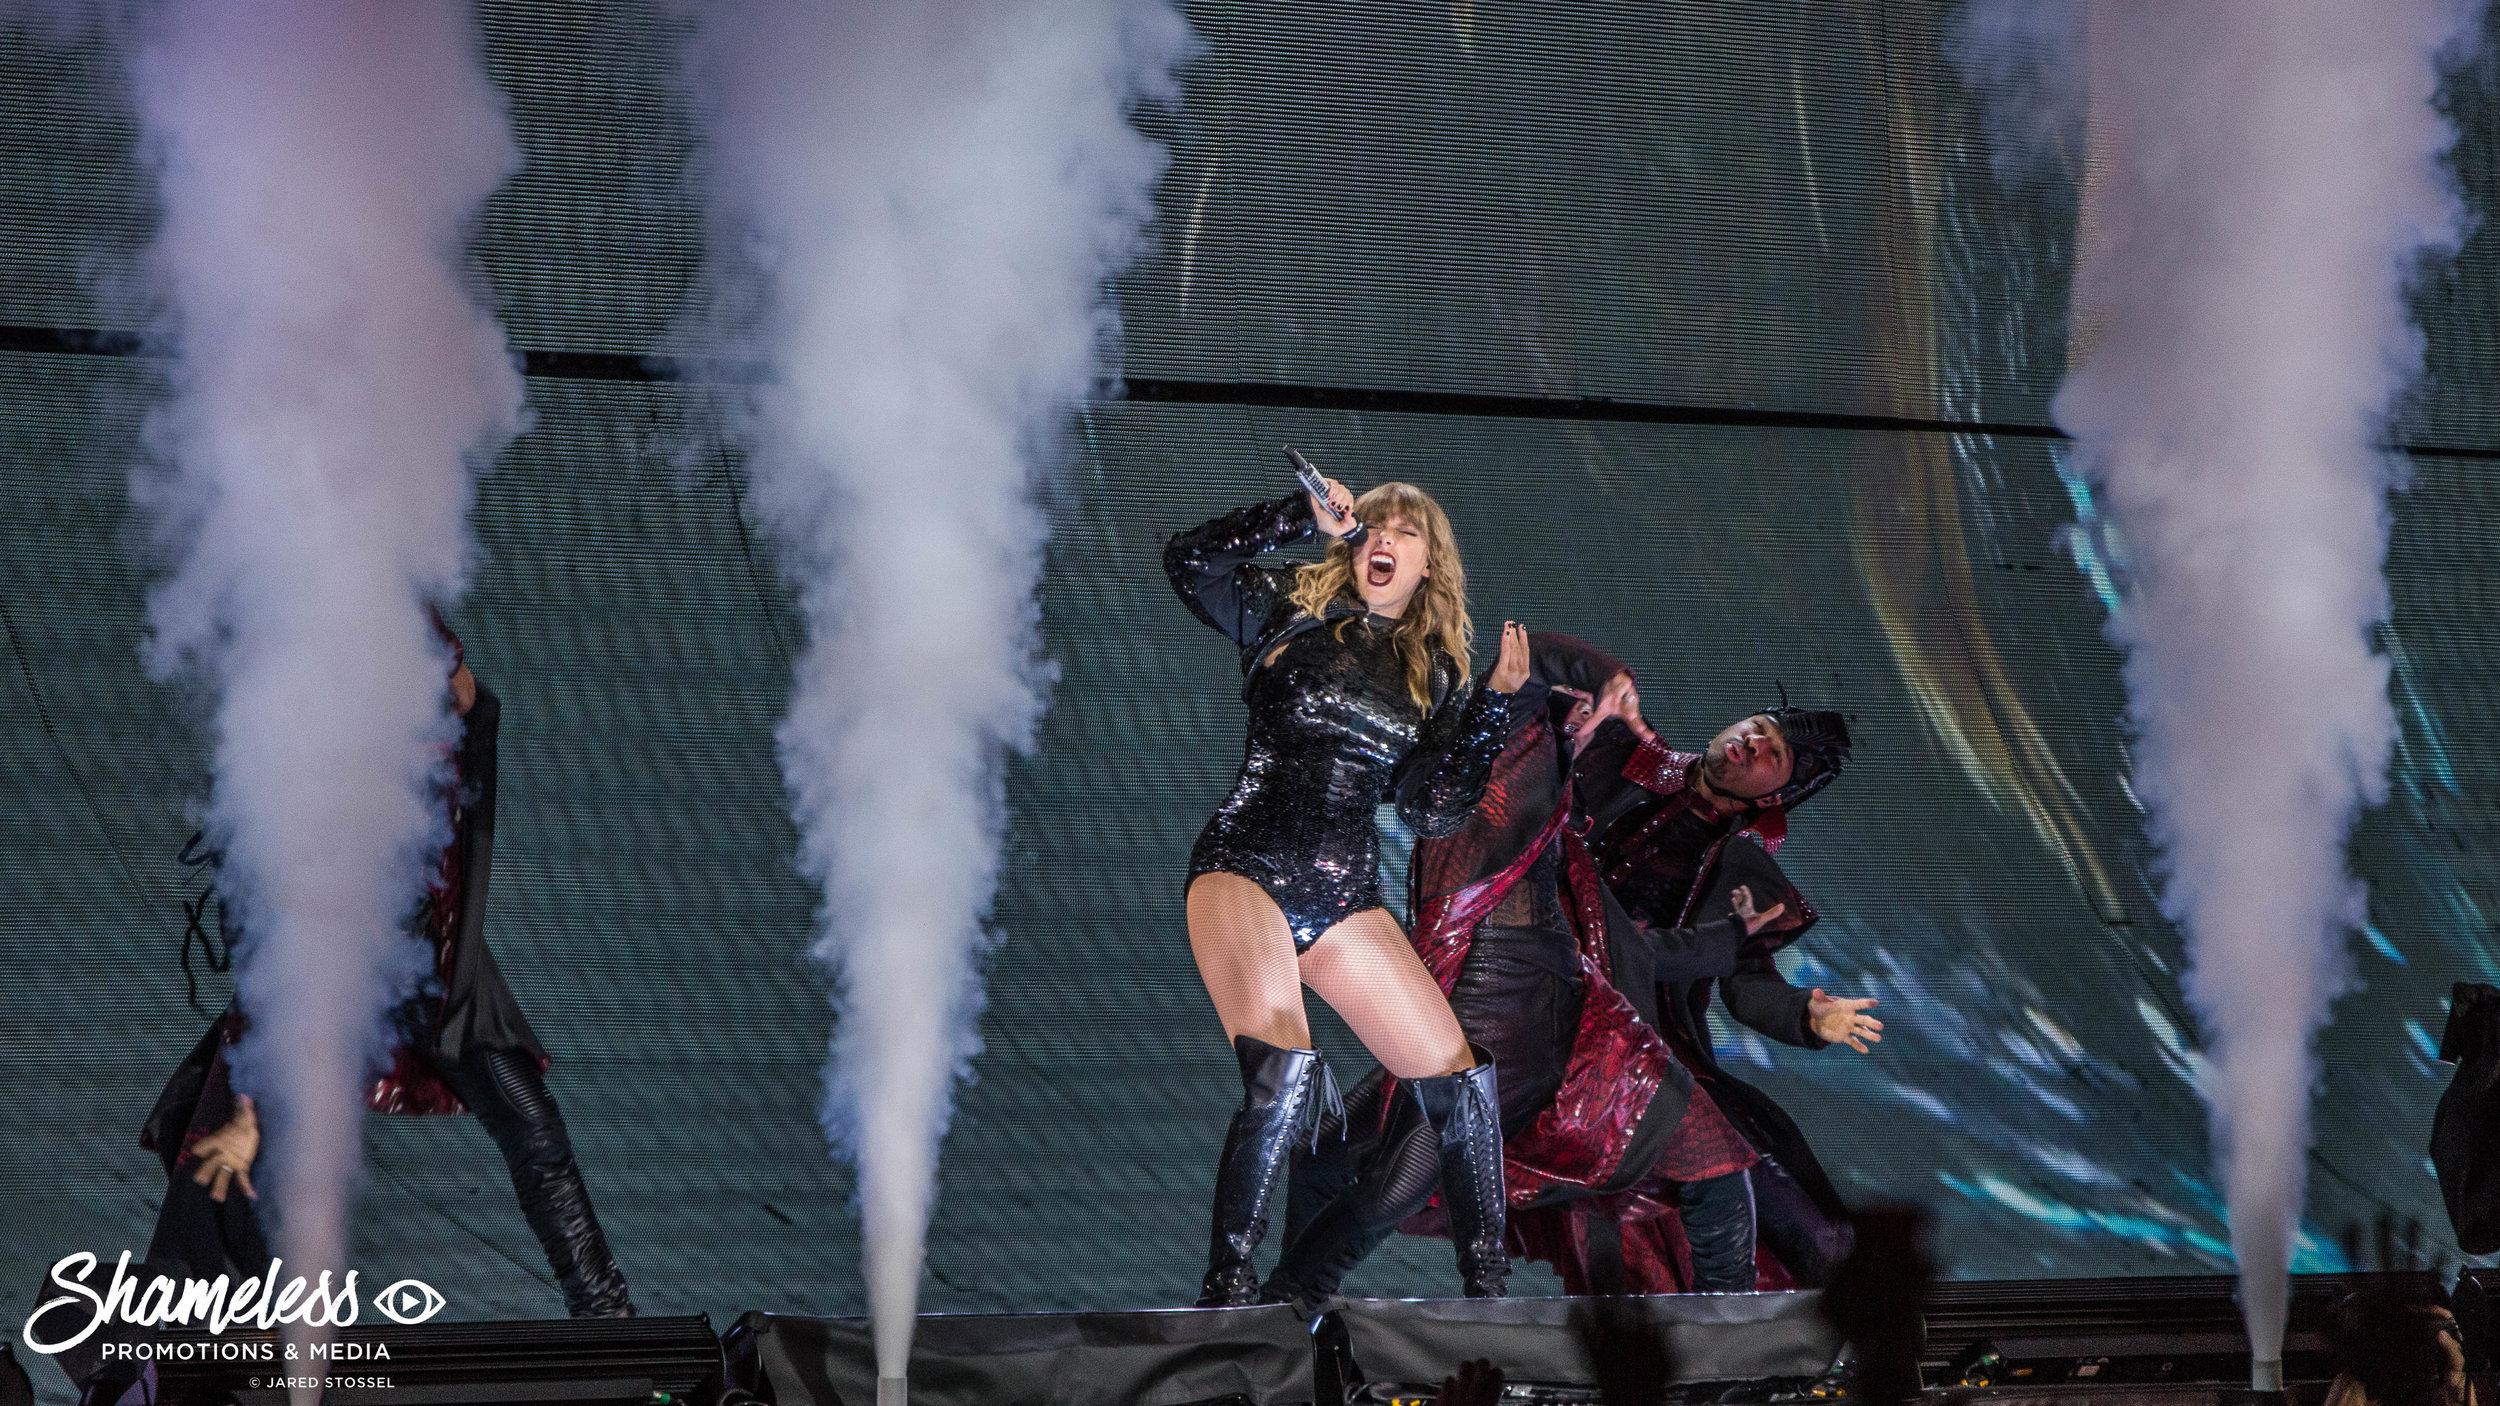 Taylor Swift 'Reputation' Tour @ Levi's Stadium: May 2018